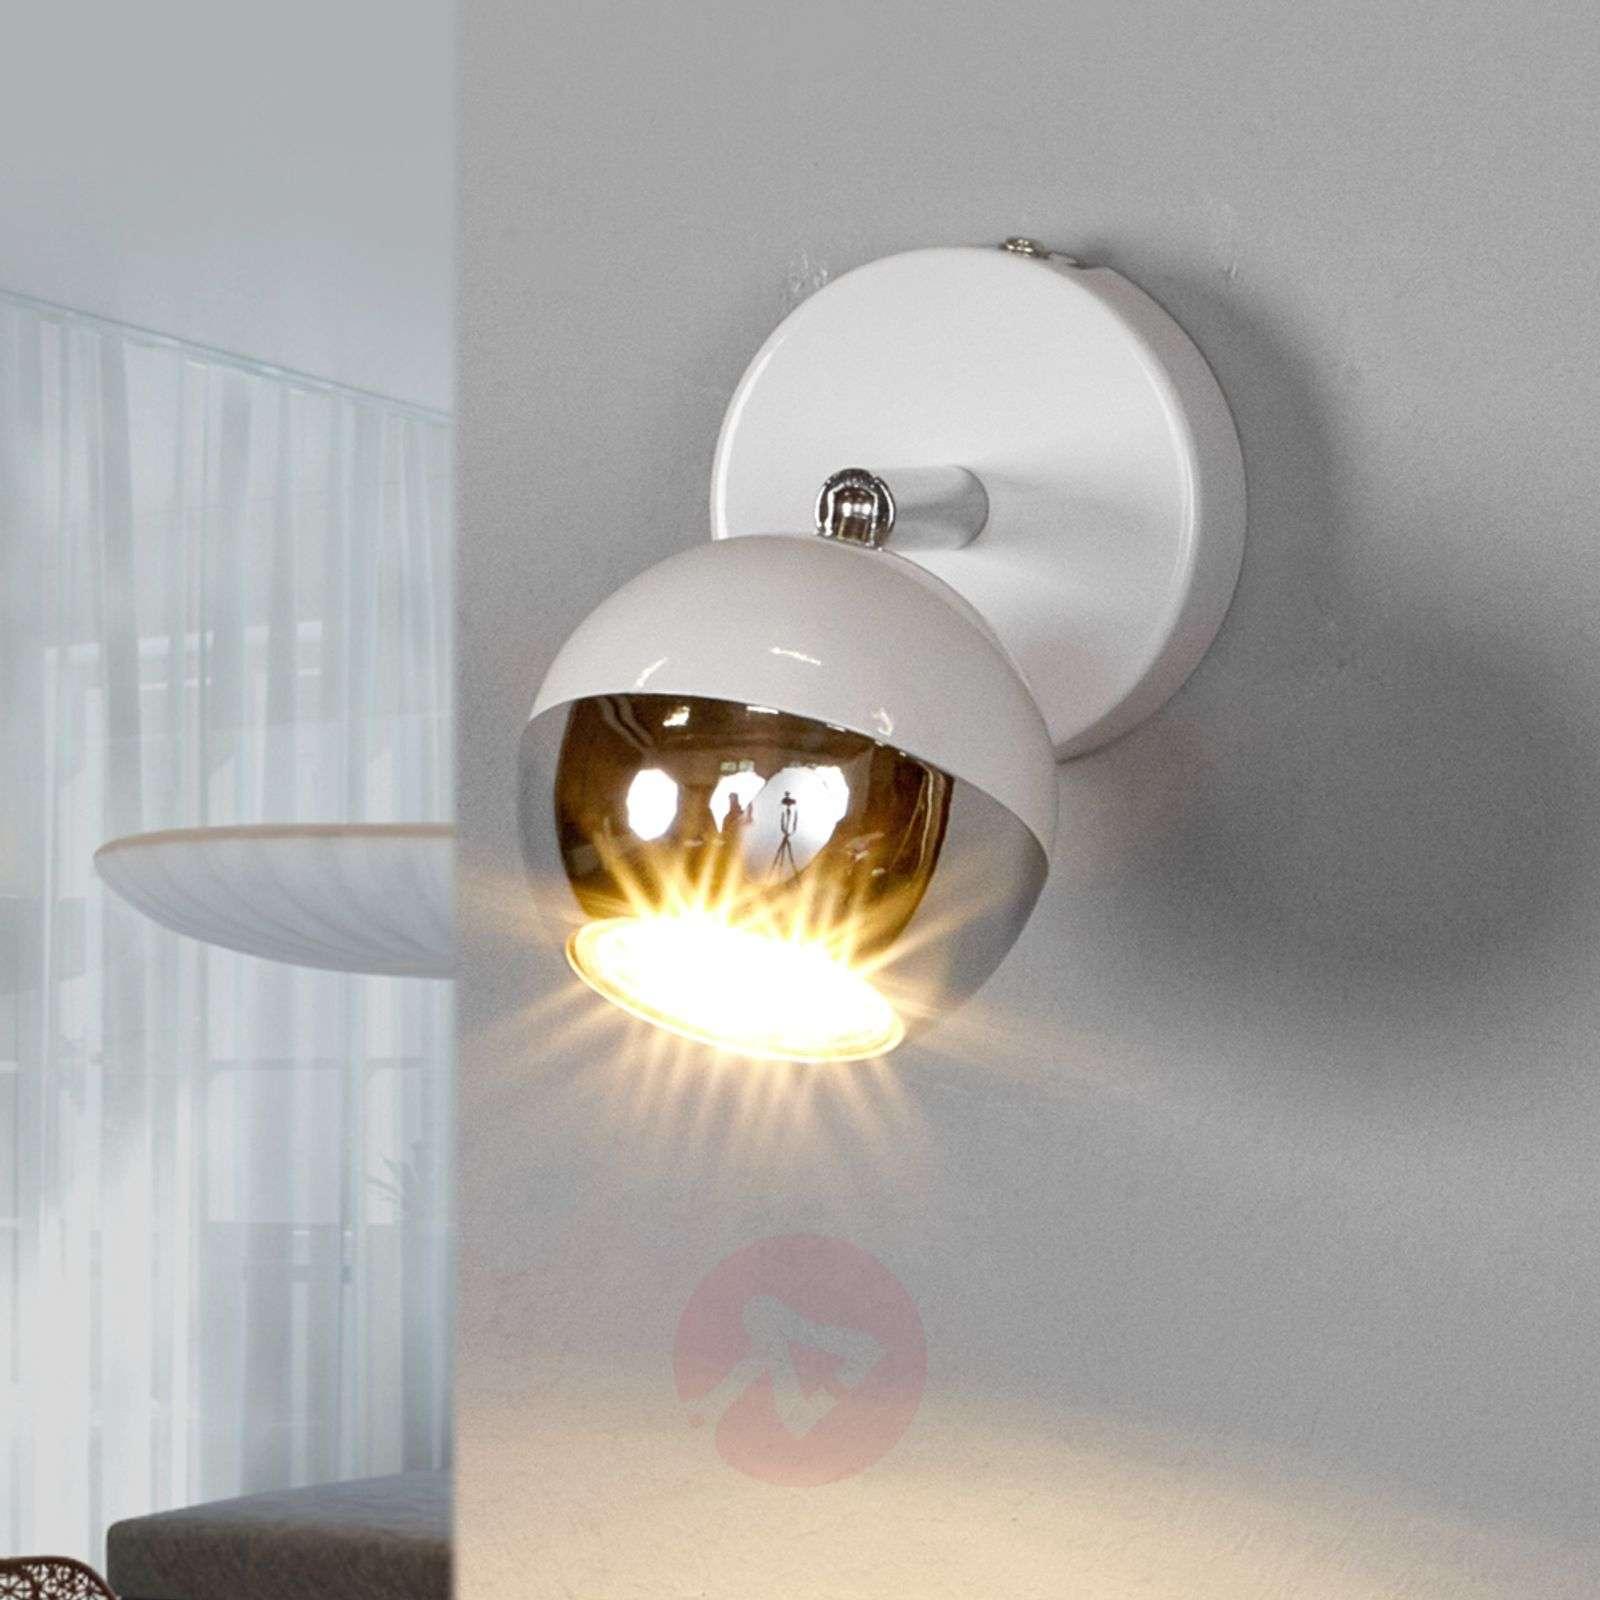 White GU10 spotlight Arvin with LED lamp-9970110-03